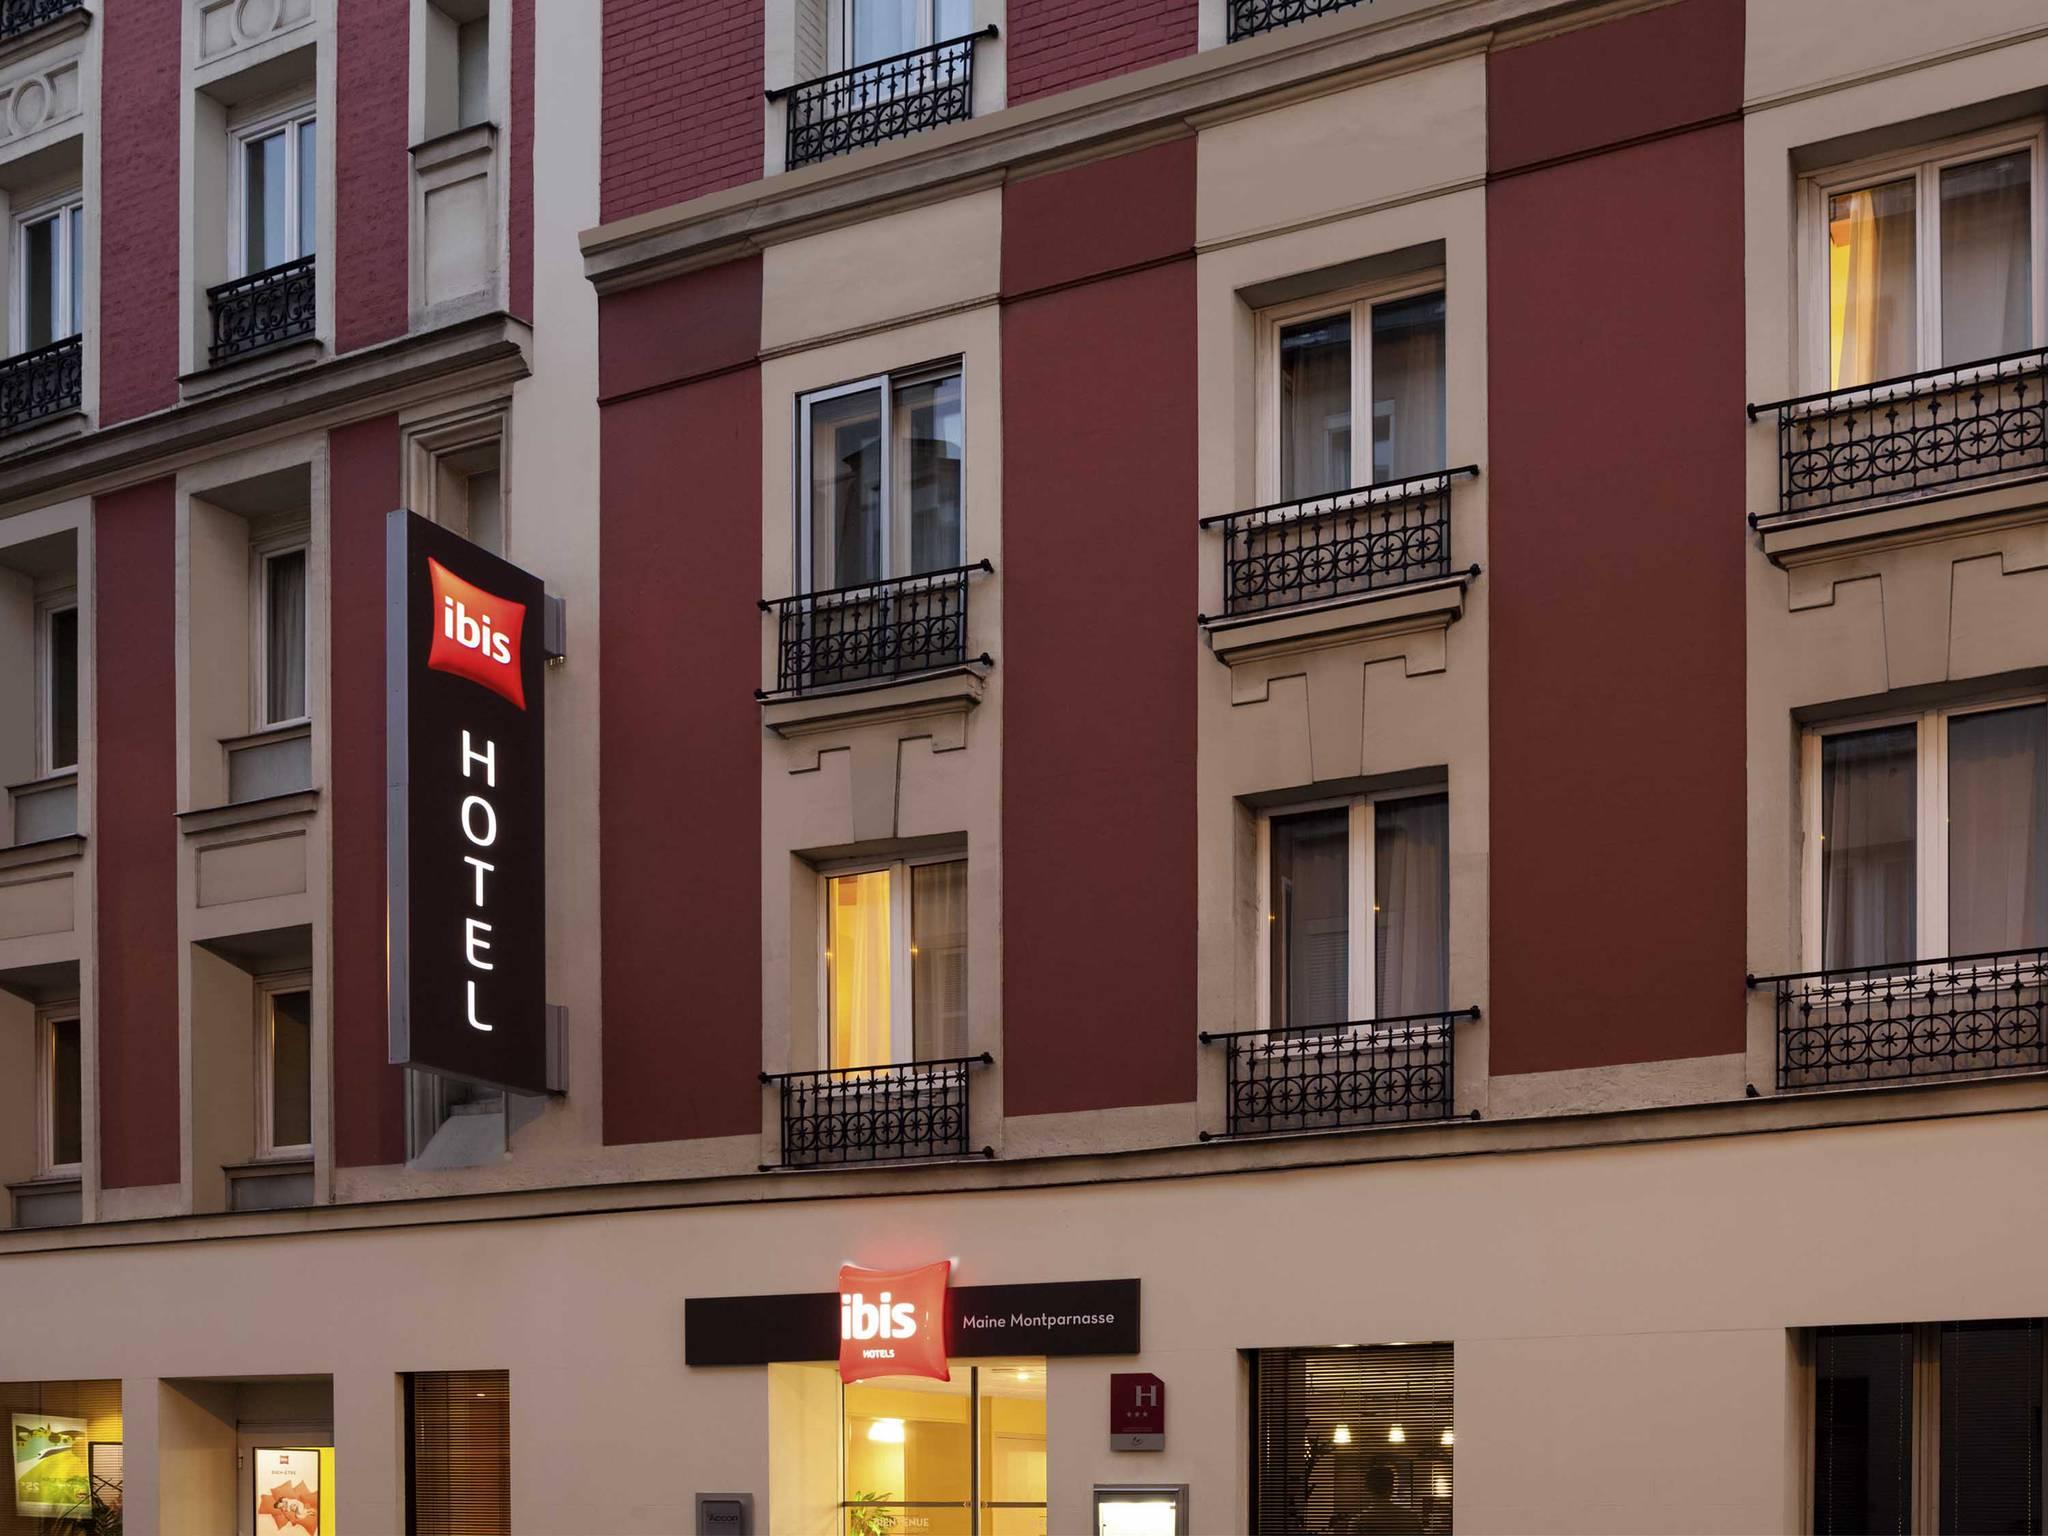 Hotel – ibis París Maine Montparnasse distrito XIV